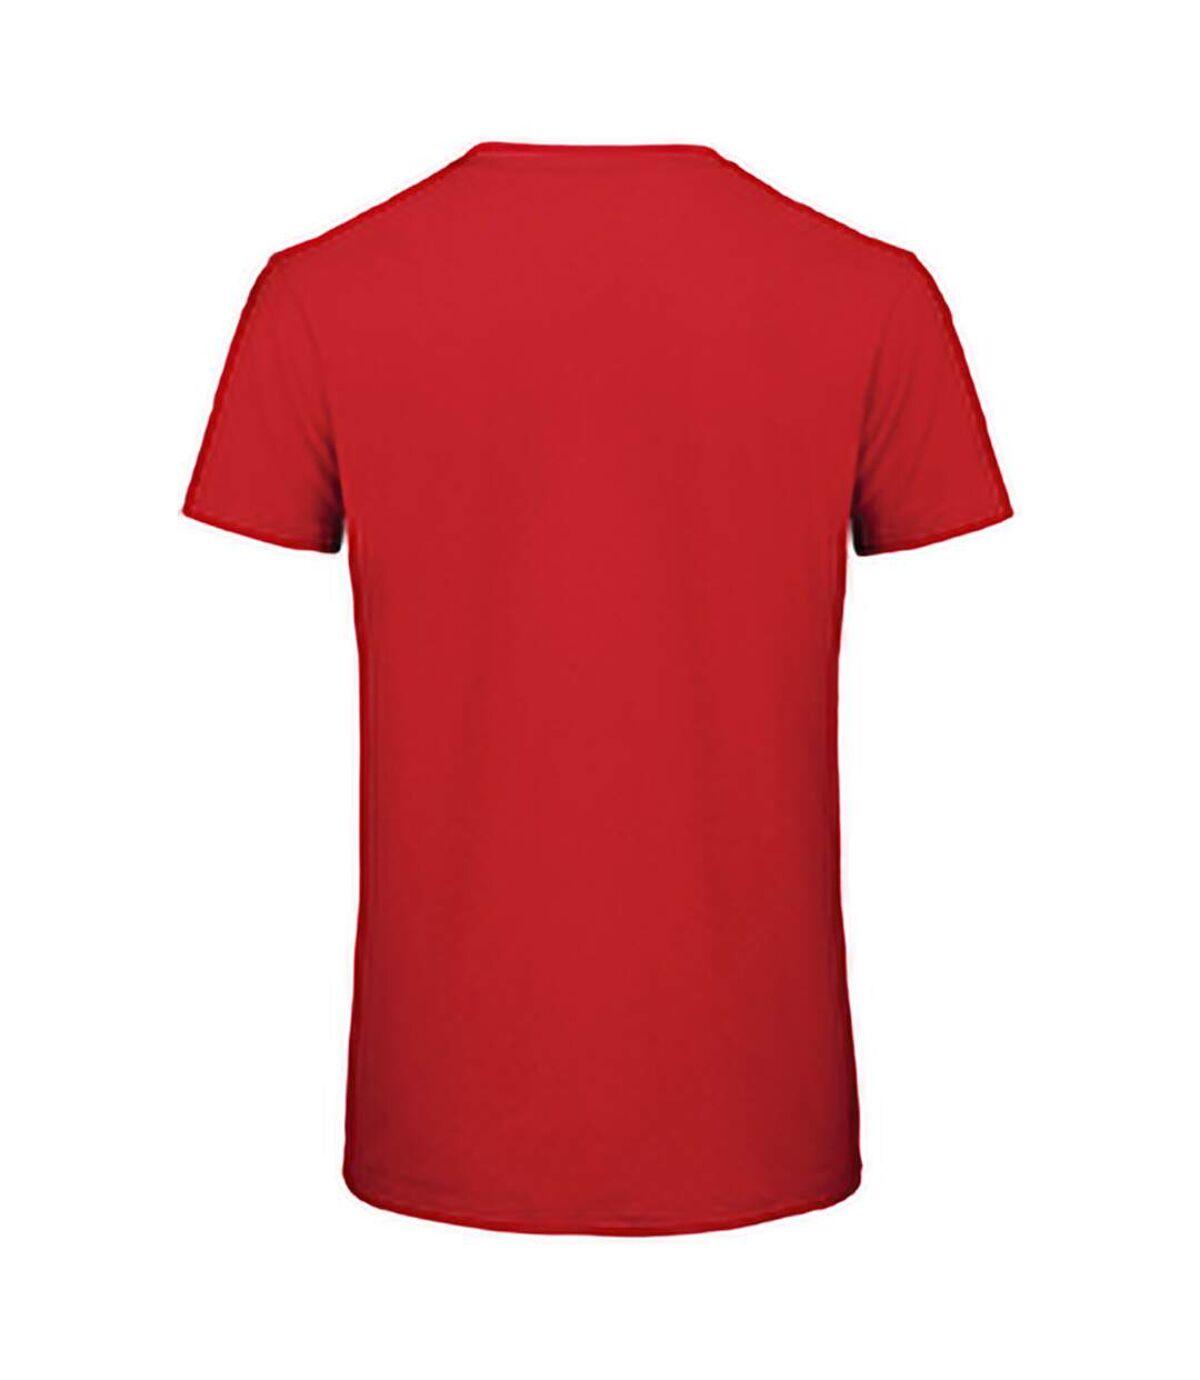 B&C Mens Favourite Organic Cotton Crew T-Shirt (Red) - UTBC3635